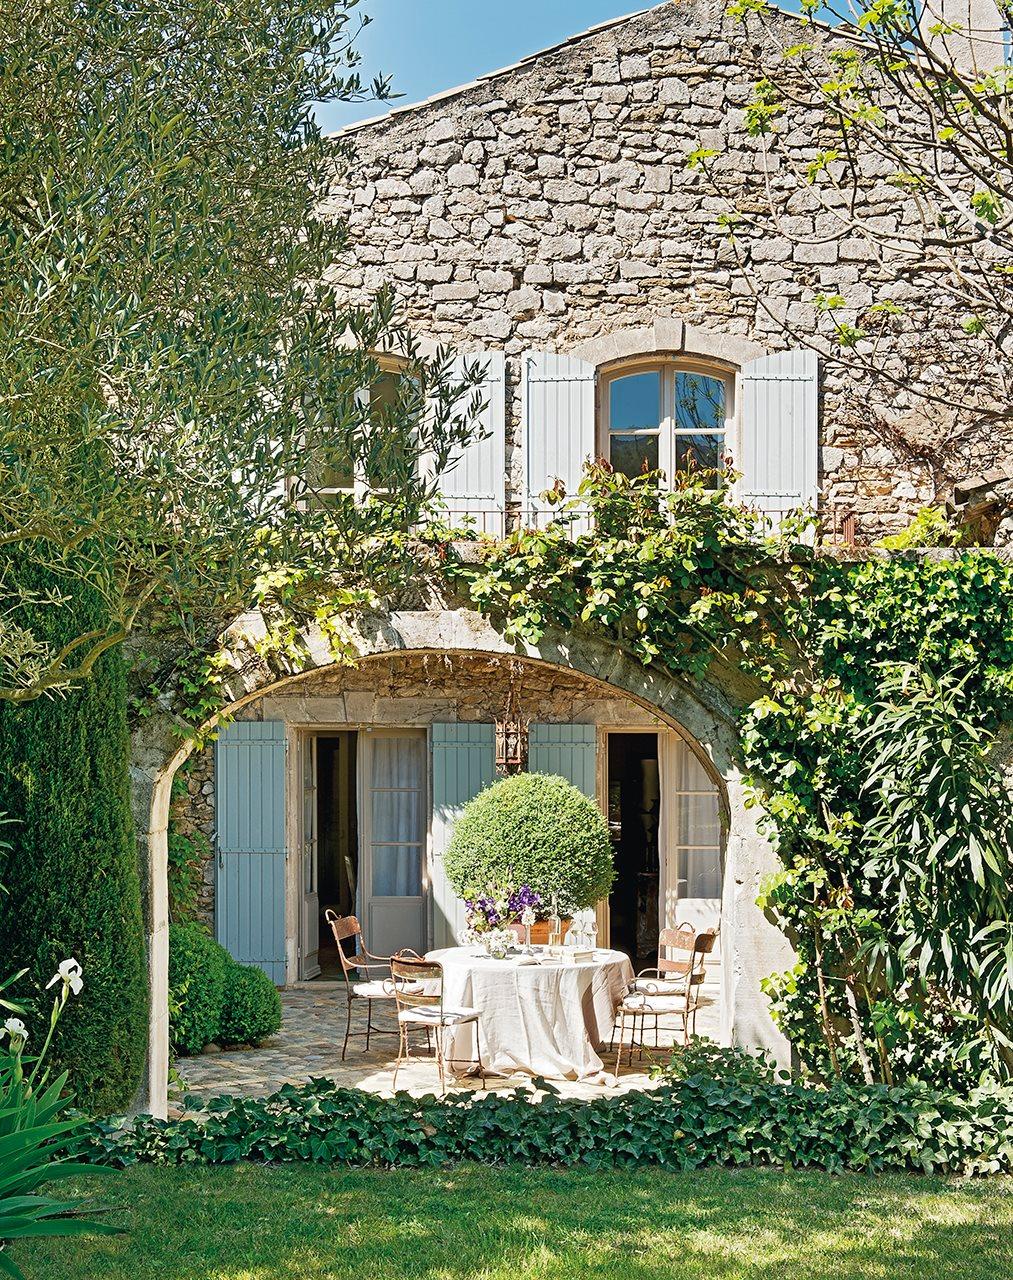 fachada de piedra de casa rustica con mesa y sillas junto al arco 1013x1280 - La Ferme du Bon Dieu: A farm converted into a house which holds a love story